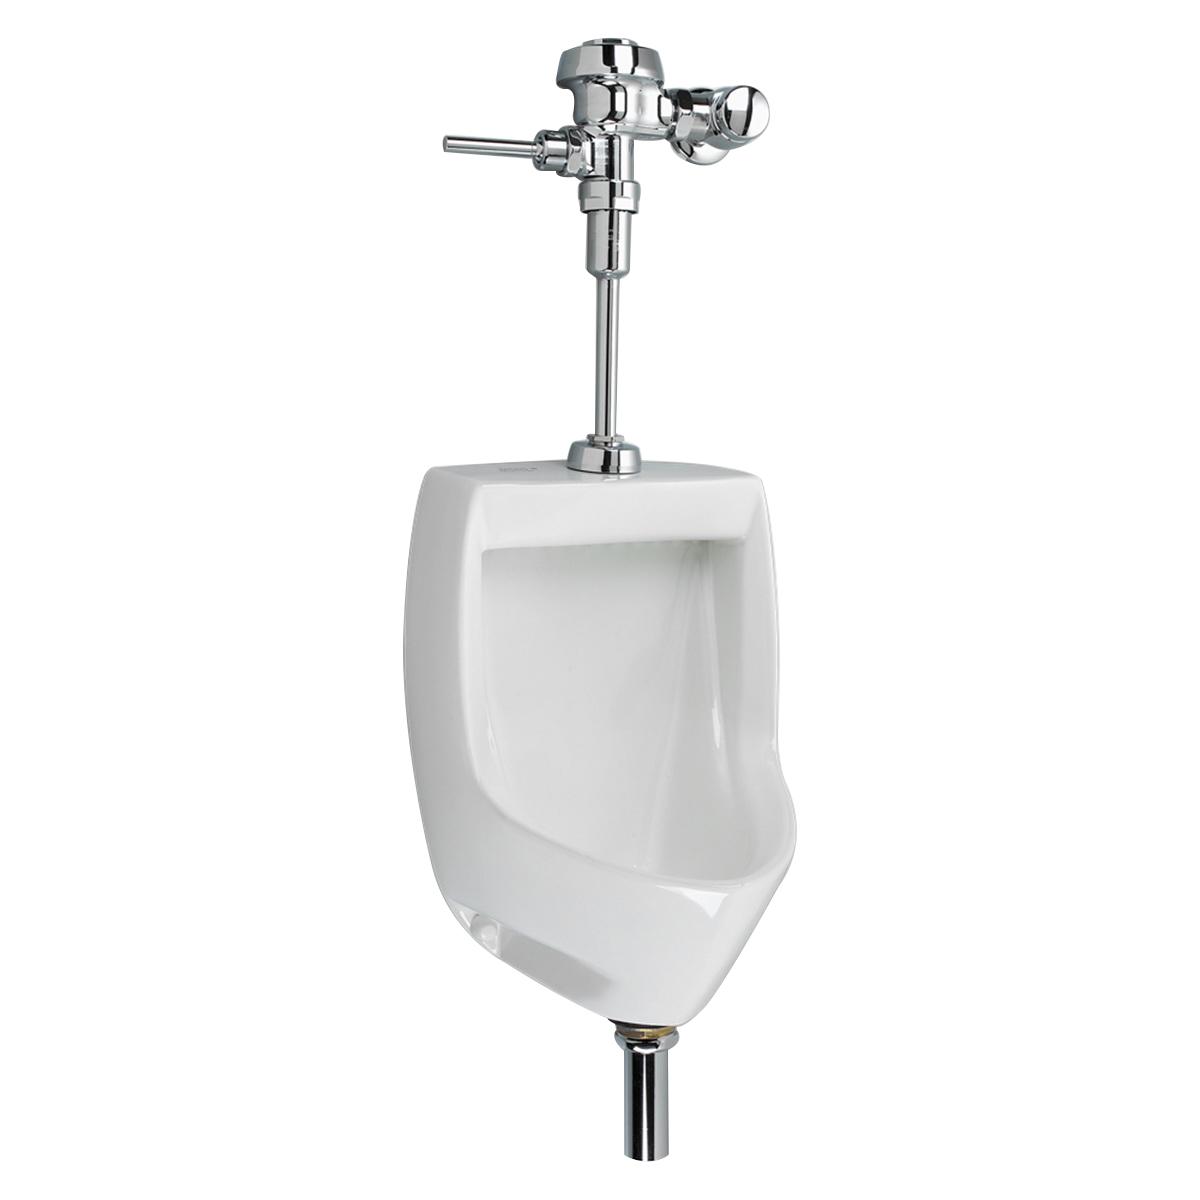 American Standard Maybrook® 6581.001.020 White Vitreous China Wall Mount Low Consumption Universal Urinal, 0.125 - 1 gpf